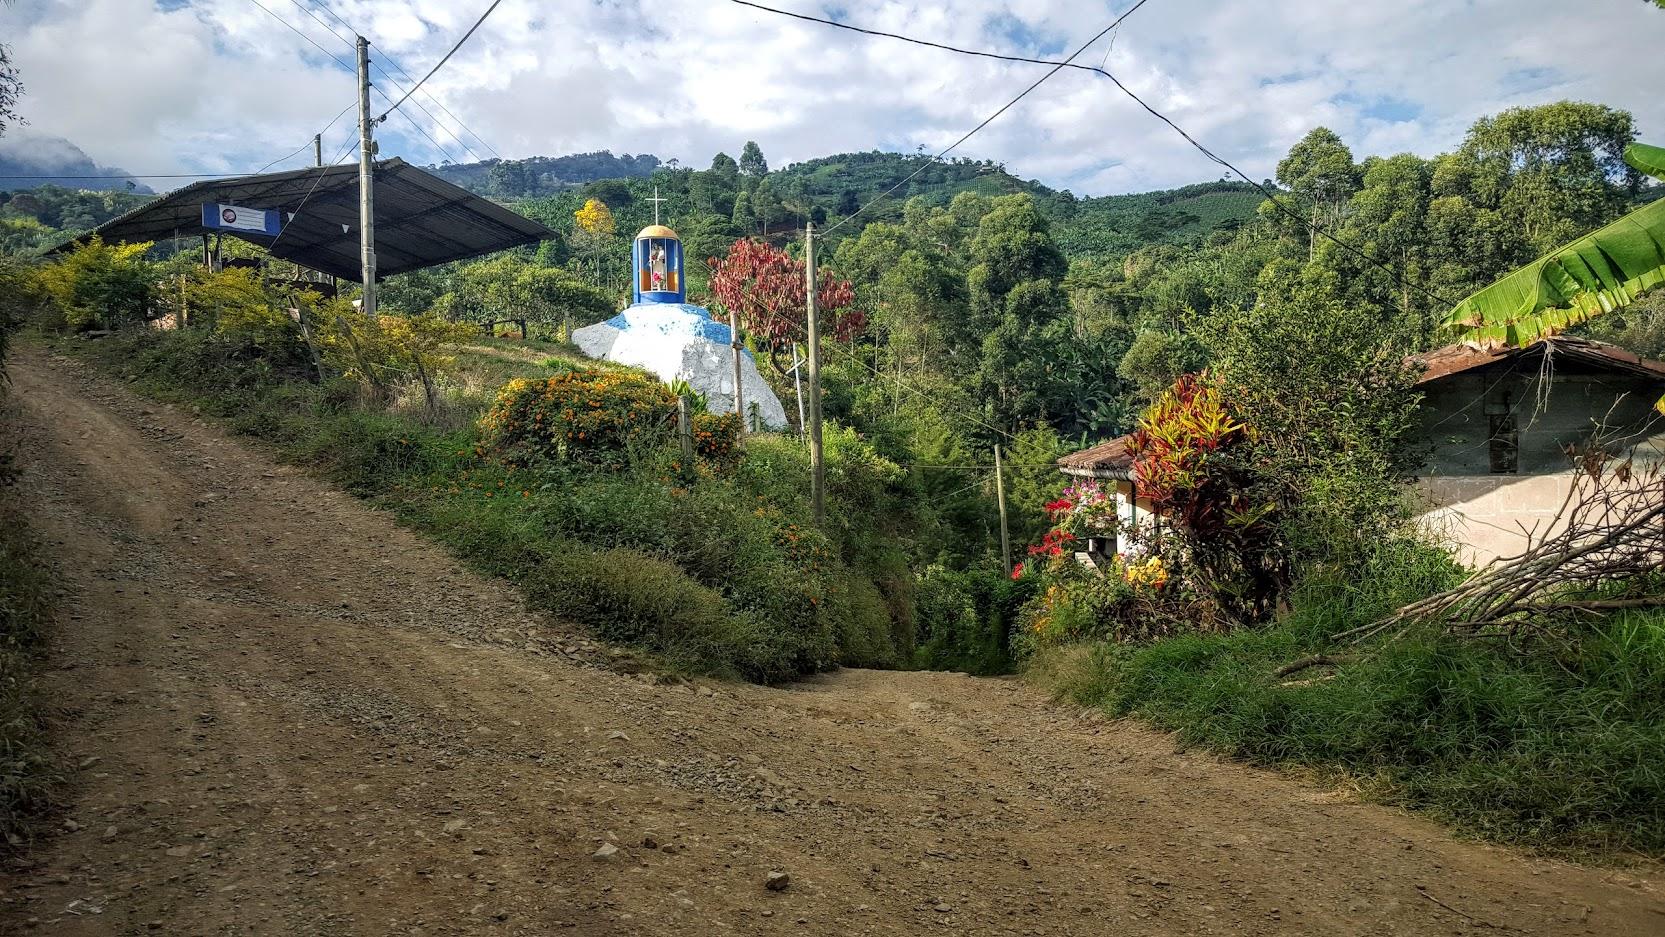 Serranias jardin antioquia for Antioquia jardin